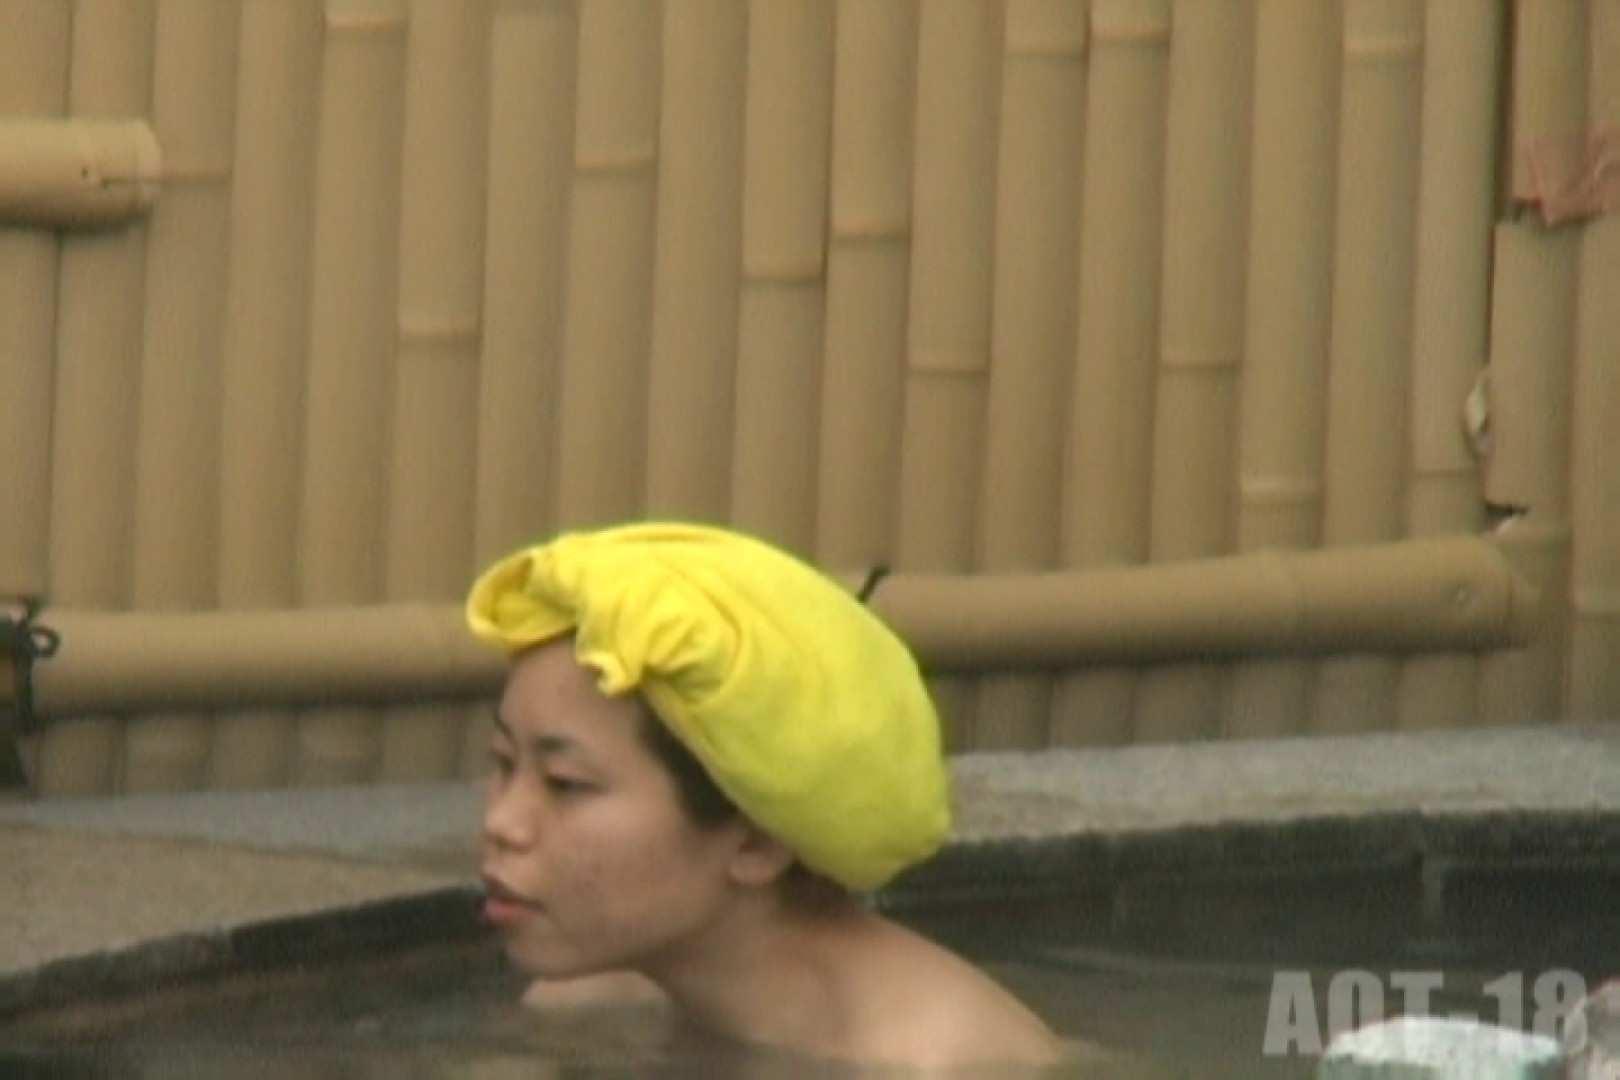 Aquaな露天風呂Vol.864 盗撮 のぞき動画画像 68画像 53